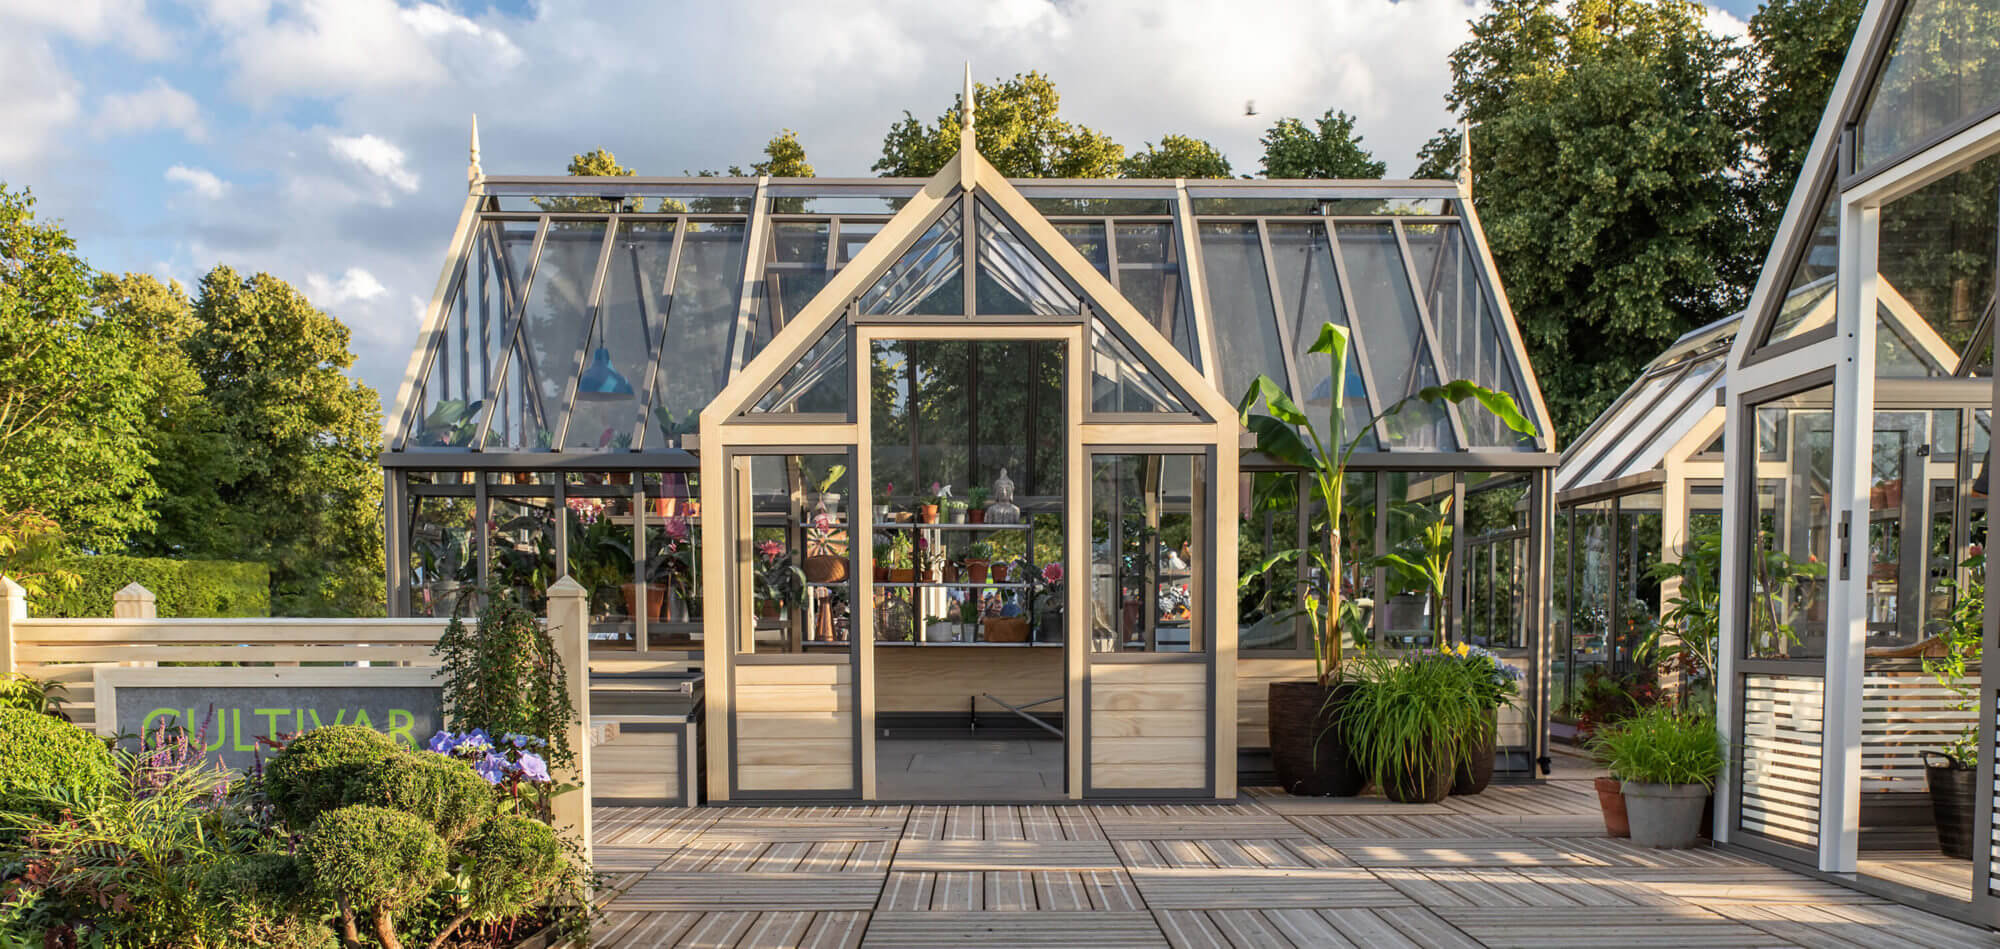 Bespoke Greenhouses